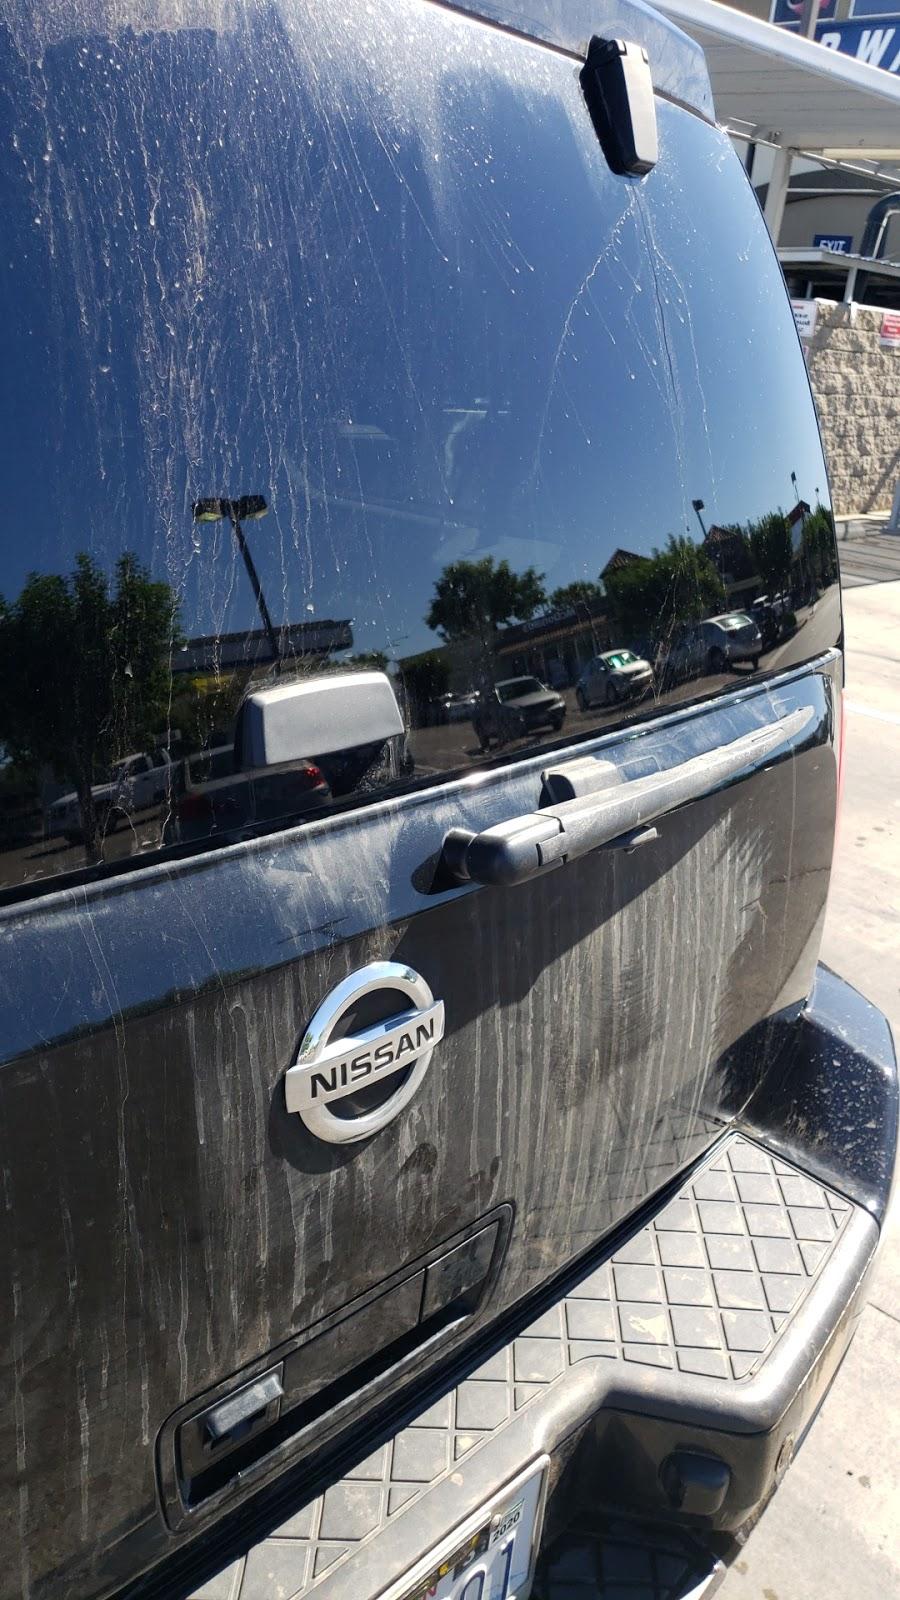 M1 Express Car Wash - car wash  | Photo 2 of 8 | Address: 44846 Valley Central Way, Lancaster, CA 93536, USA | Phone: (661) 942-5777